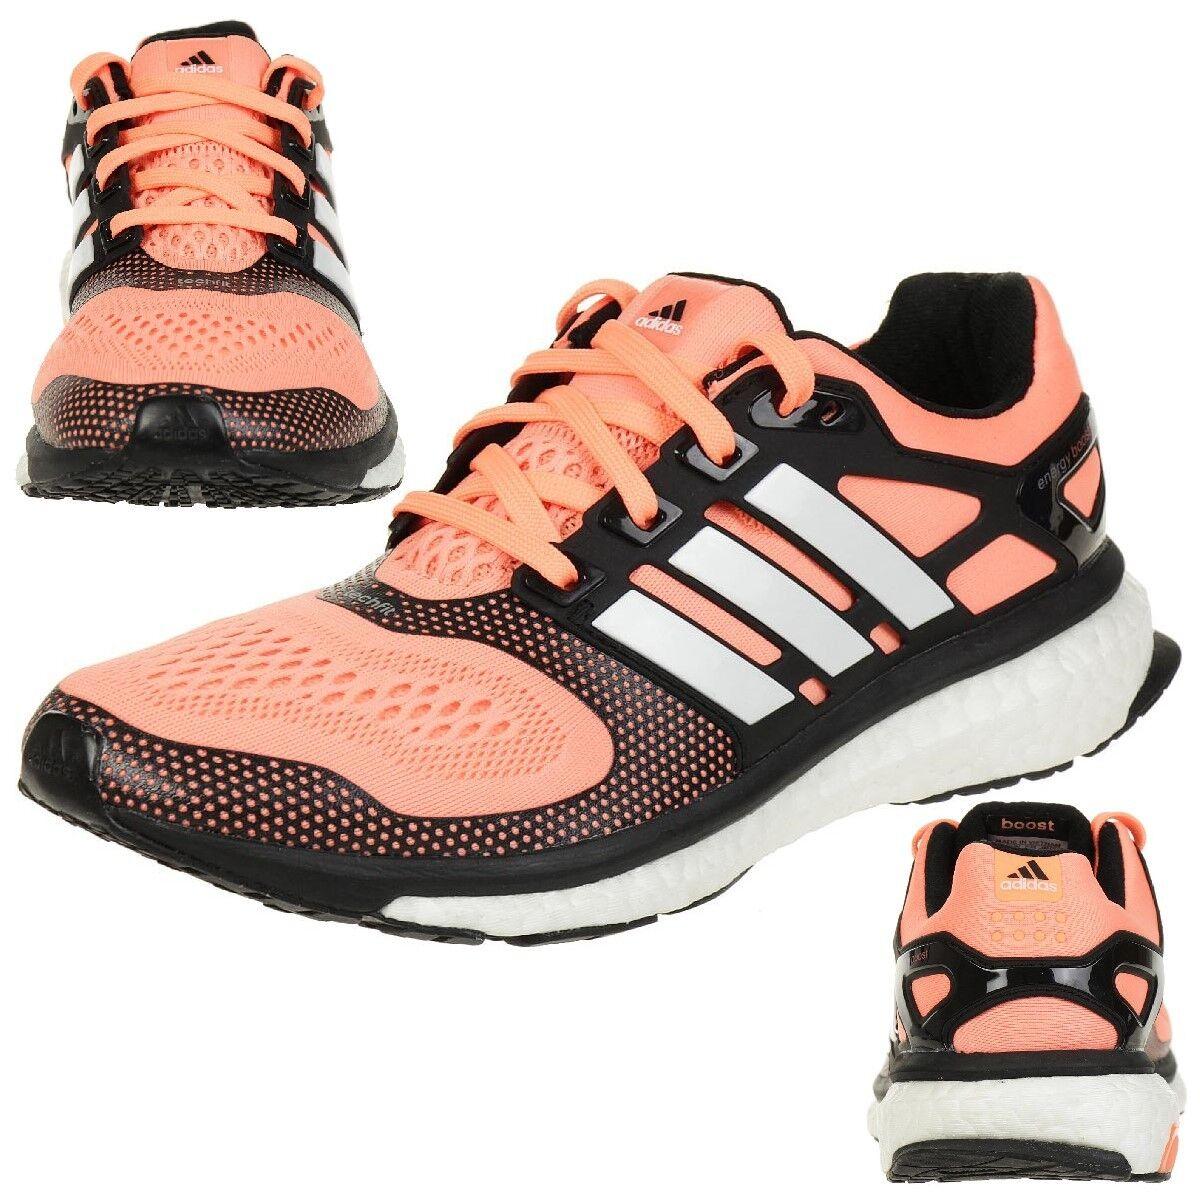 Adidas Energy Boost ESM W femmes Femmes Fitness Entraînement Course Chaussures b40903